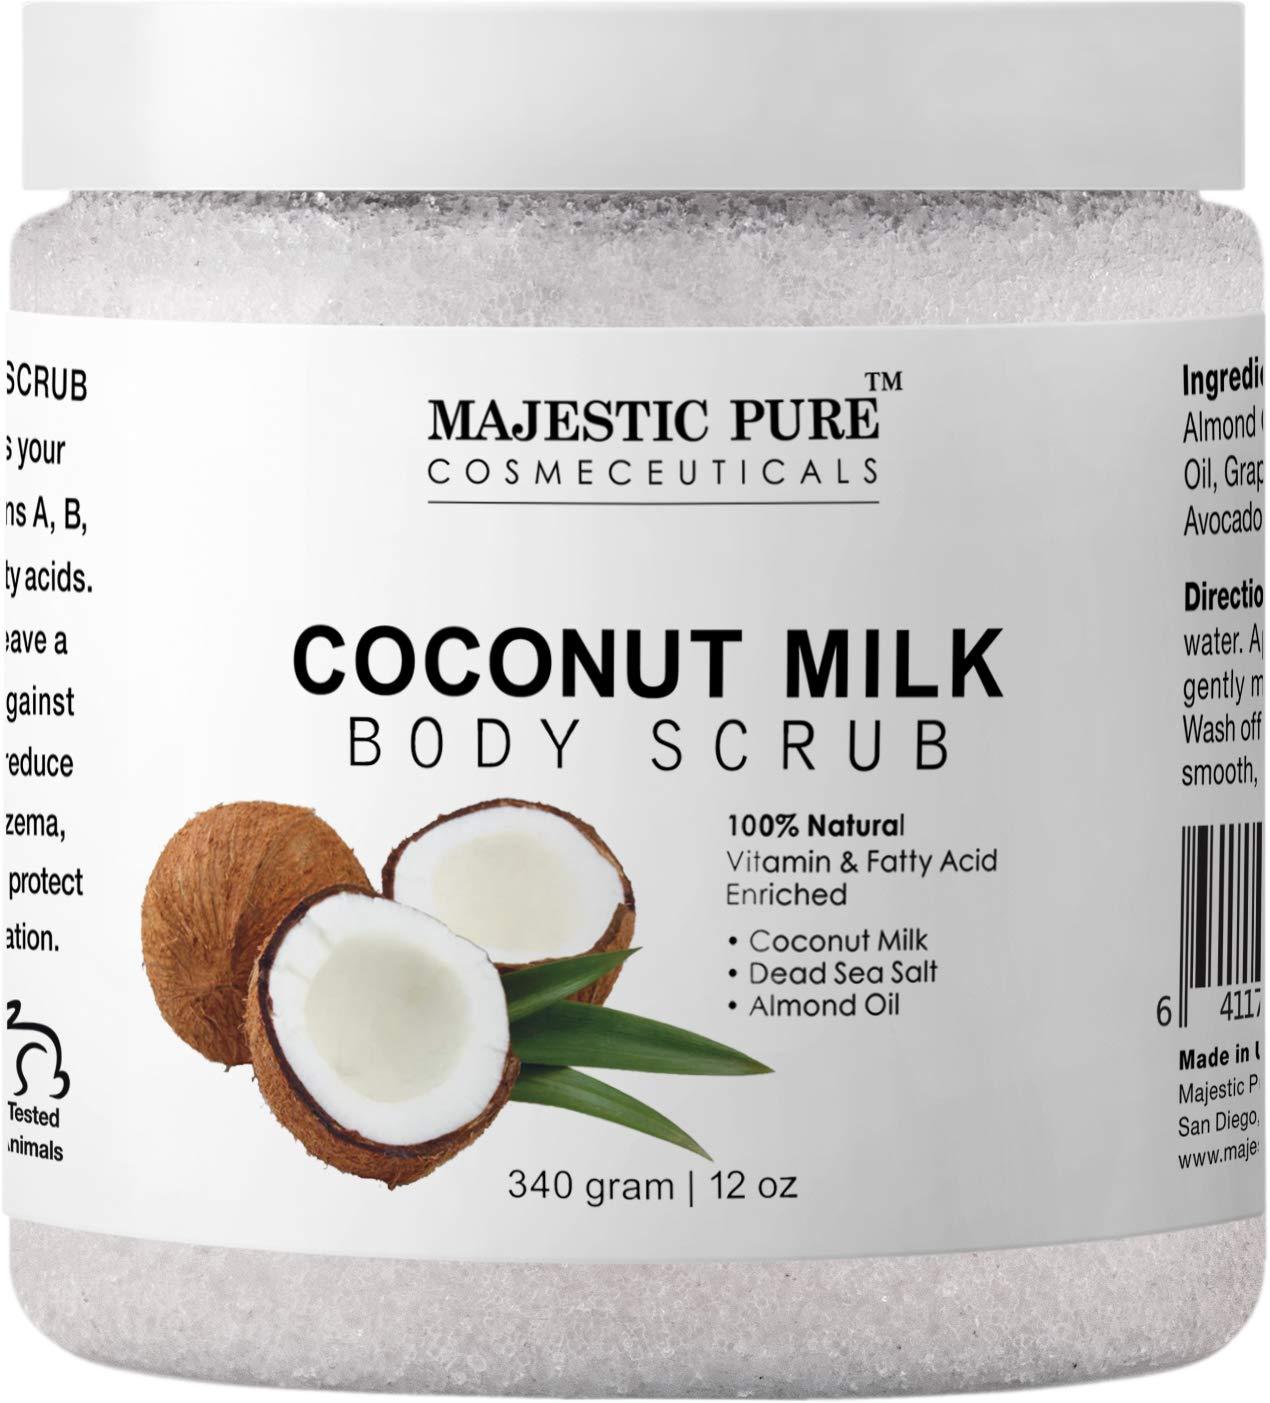 Majestic Pure Coconut Milk Body Scrub  Anti Cellulite   Exfoliator  Natural Skin Care Formula Helps with Stretch Marks  Eczema  Acne and Varicose Veins  12 Oz